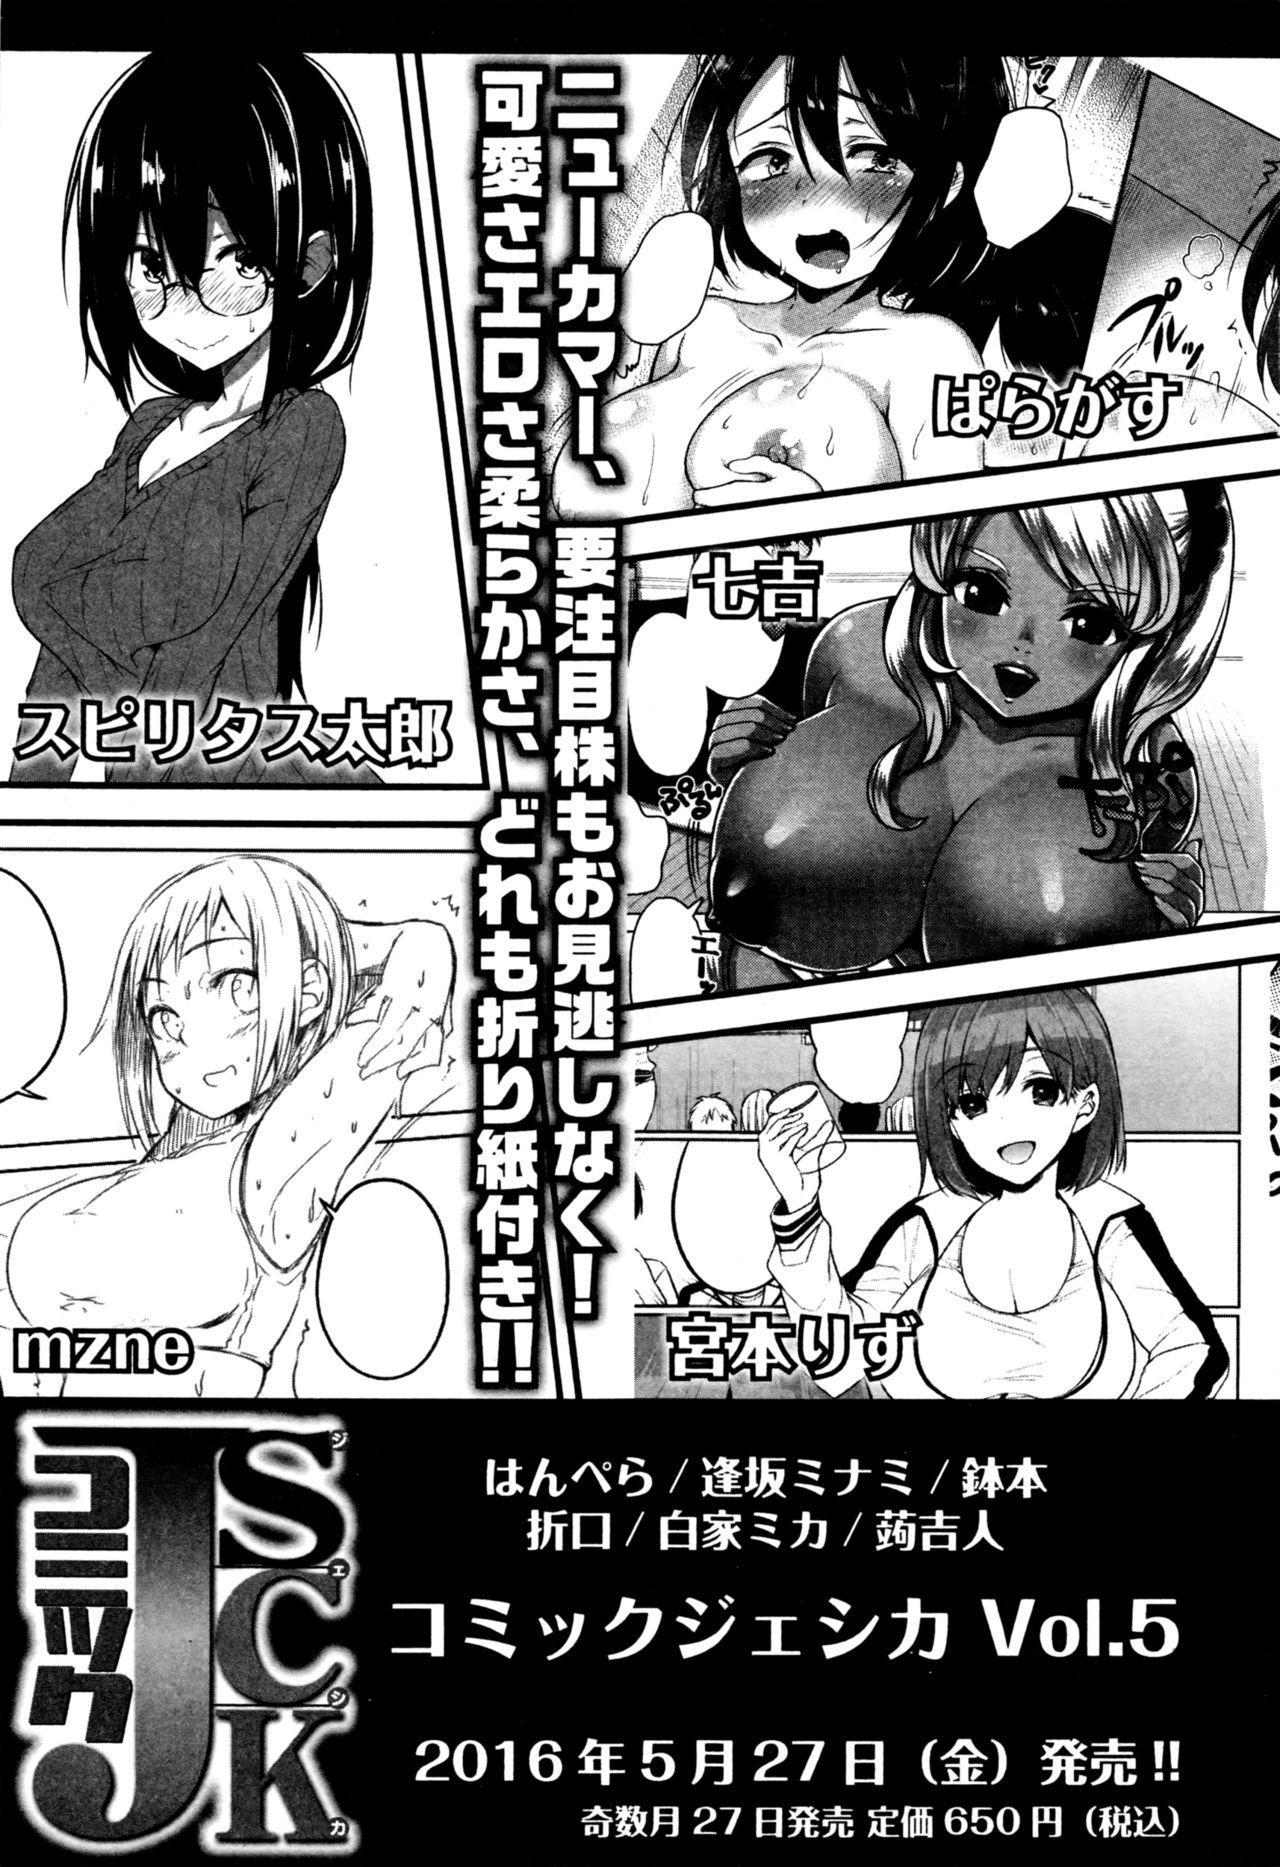 Comic JSCK Vol.4 2016-05 281